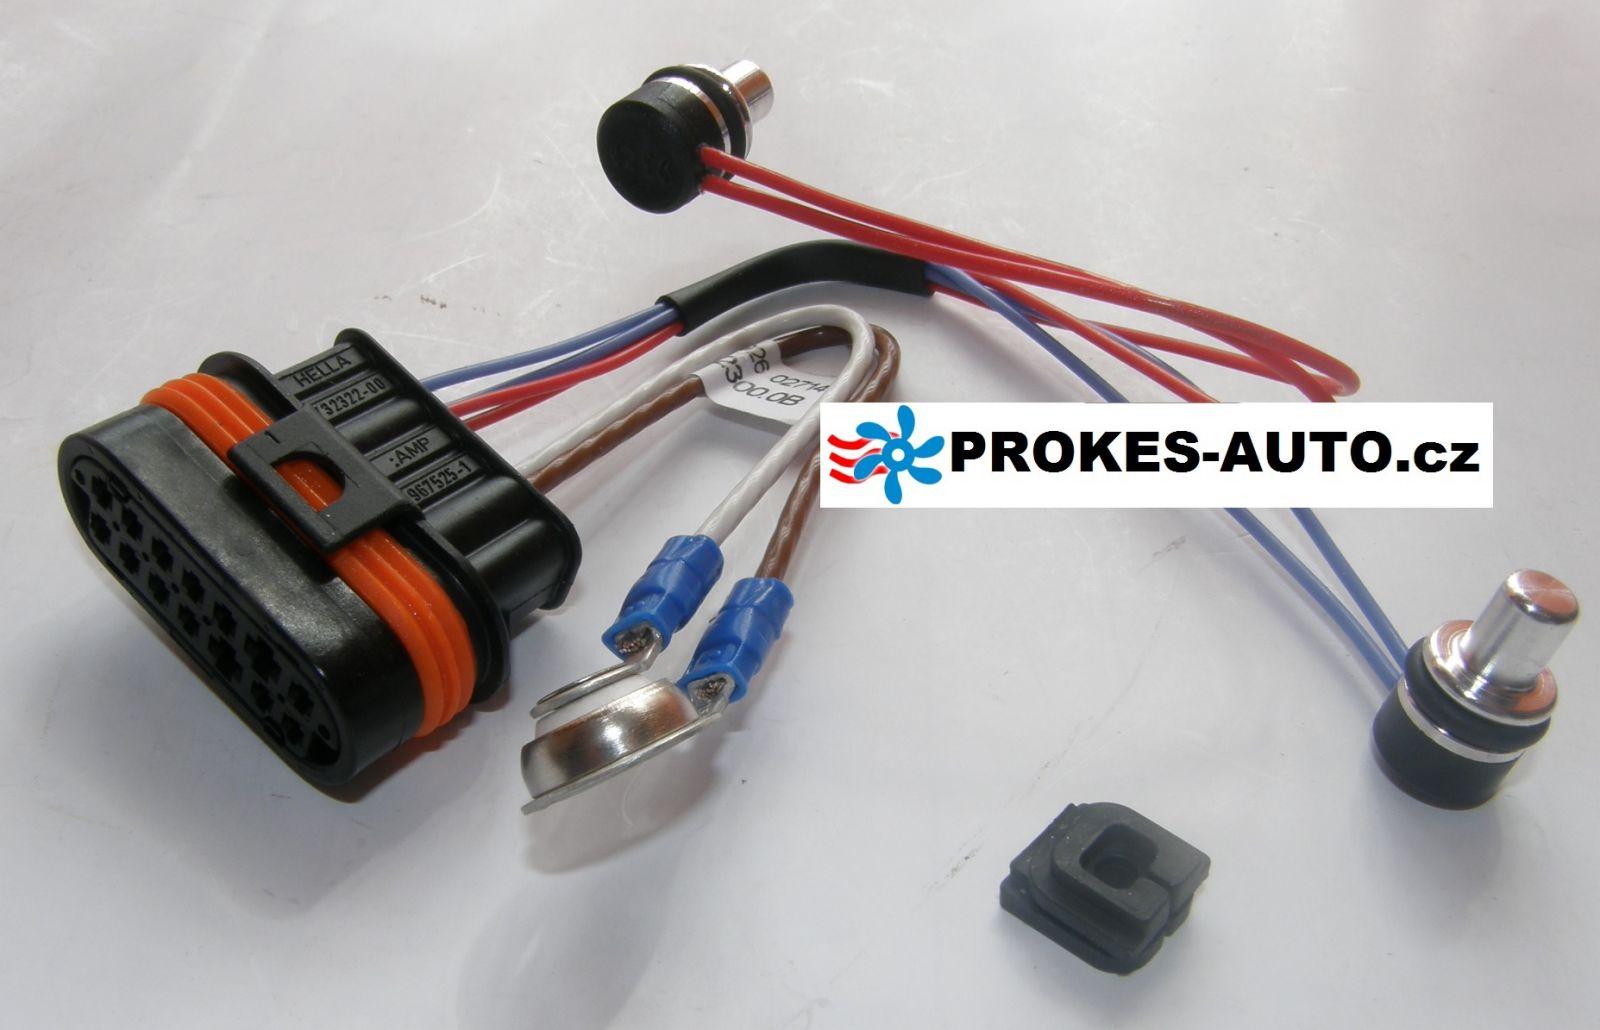 Cable harness with sensor for D5WZ / D3WZ 251922012000 / 251922012100 / 251922012300 Eberspächer